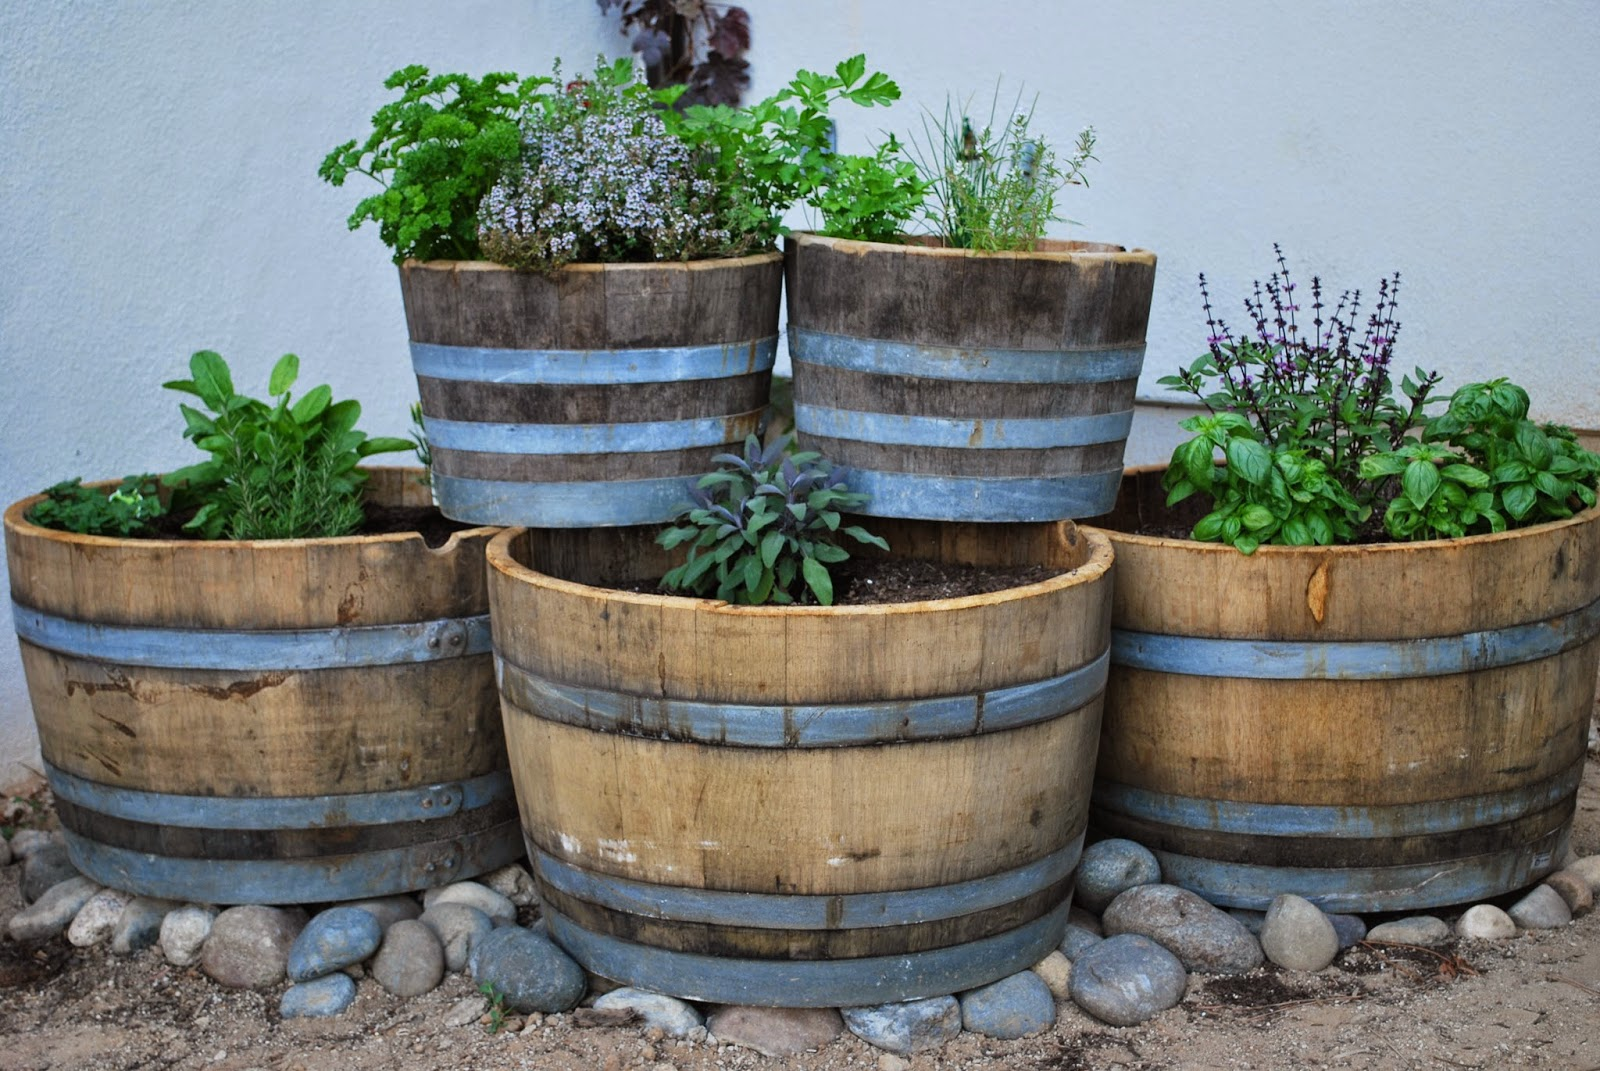 ogródek zioła